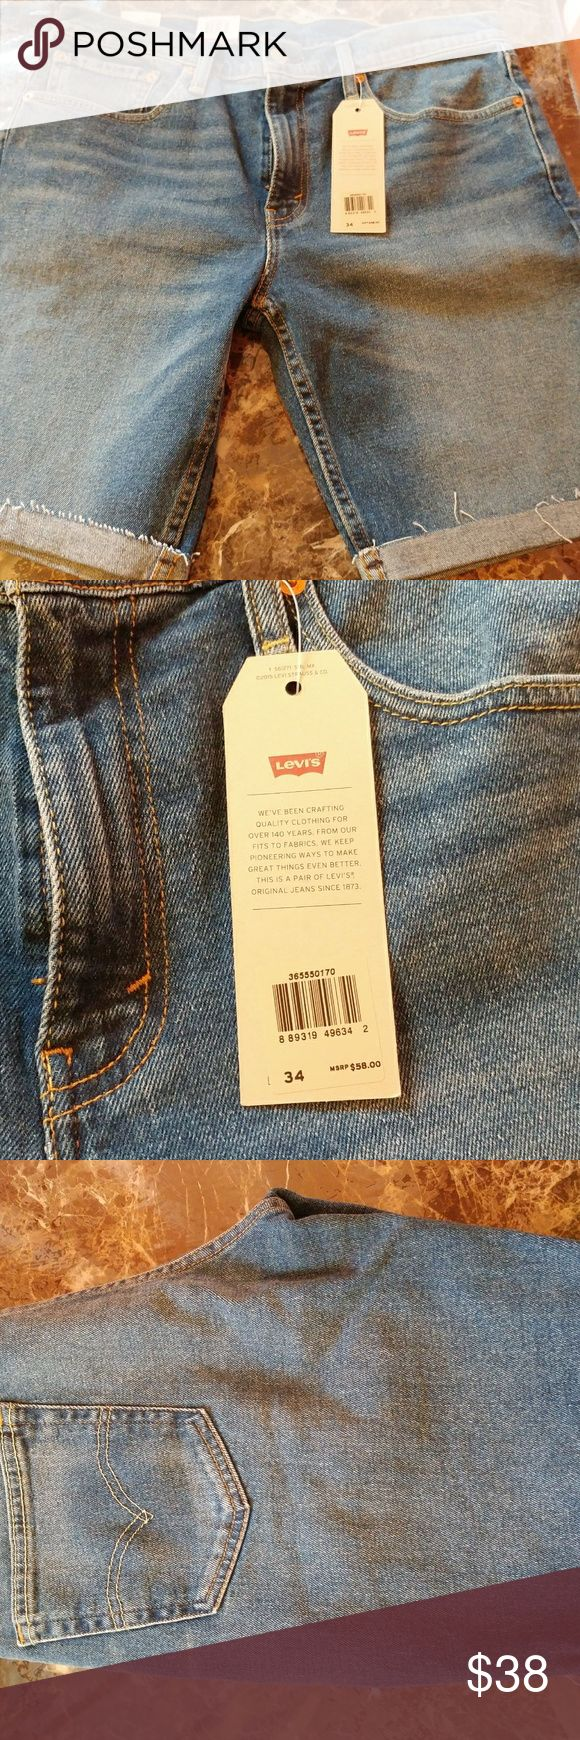 Levis 511 Blue Jean Shorts 34 Slim Levis 511 Blue Jean Shorts 34 Slim Short Cotton Blend New With Tags Levi's Shorts Jean Shorts